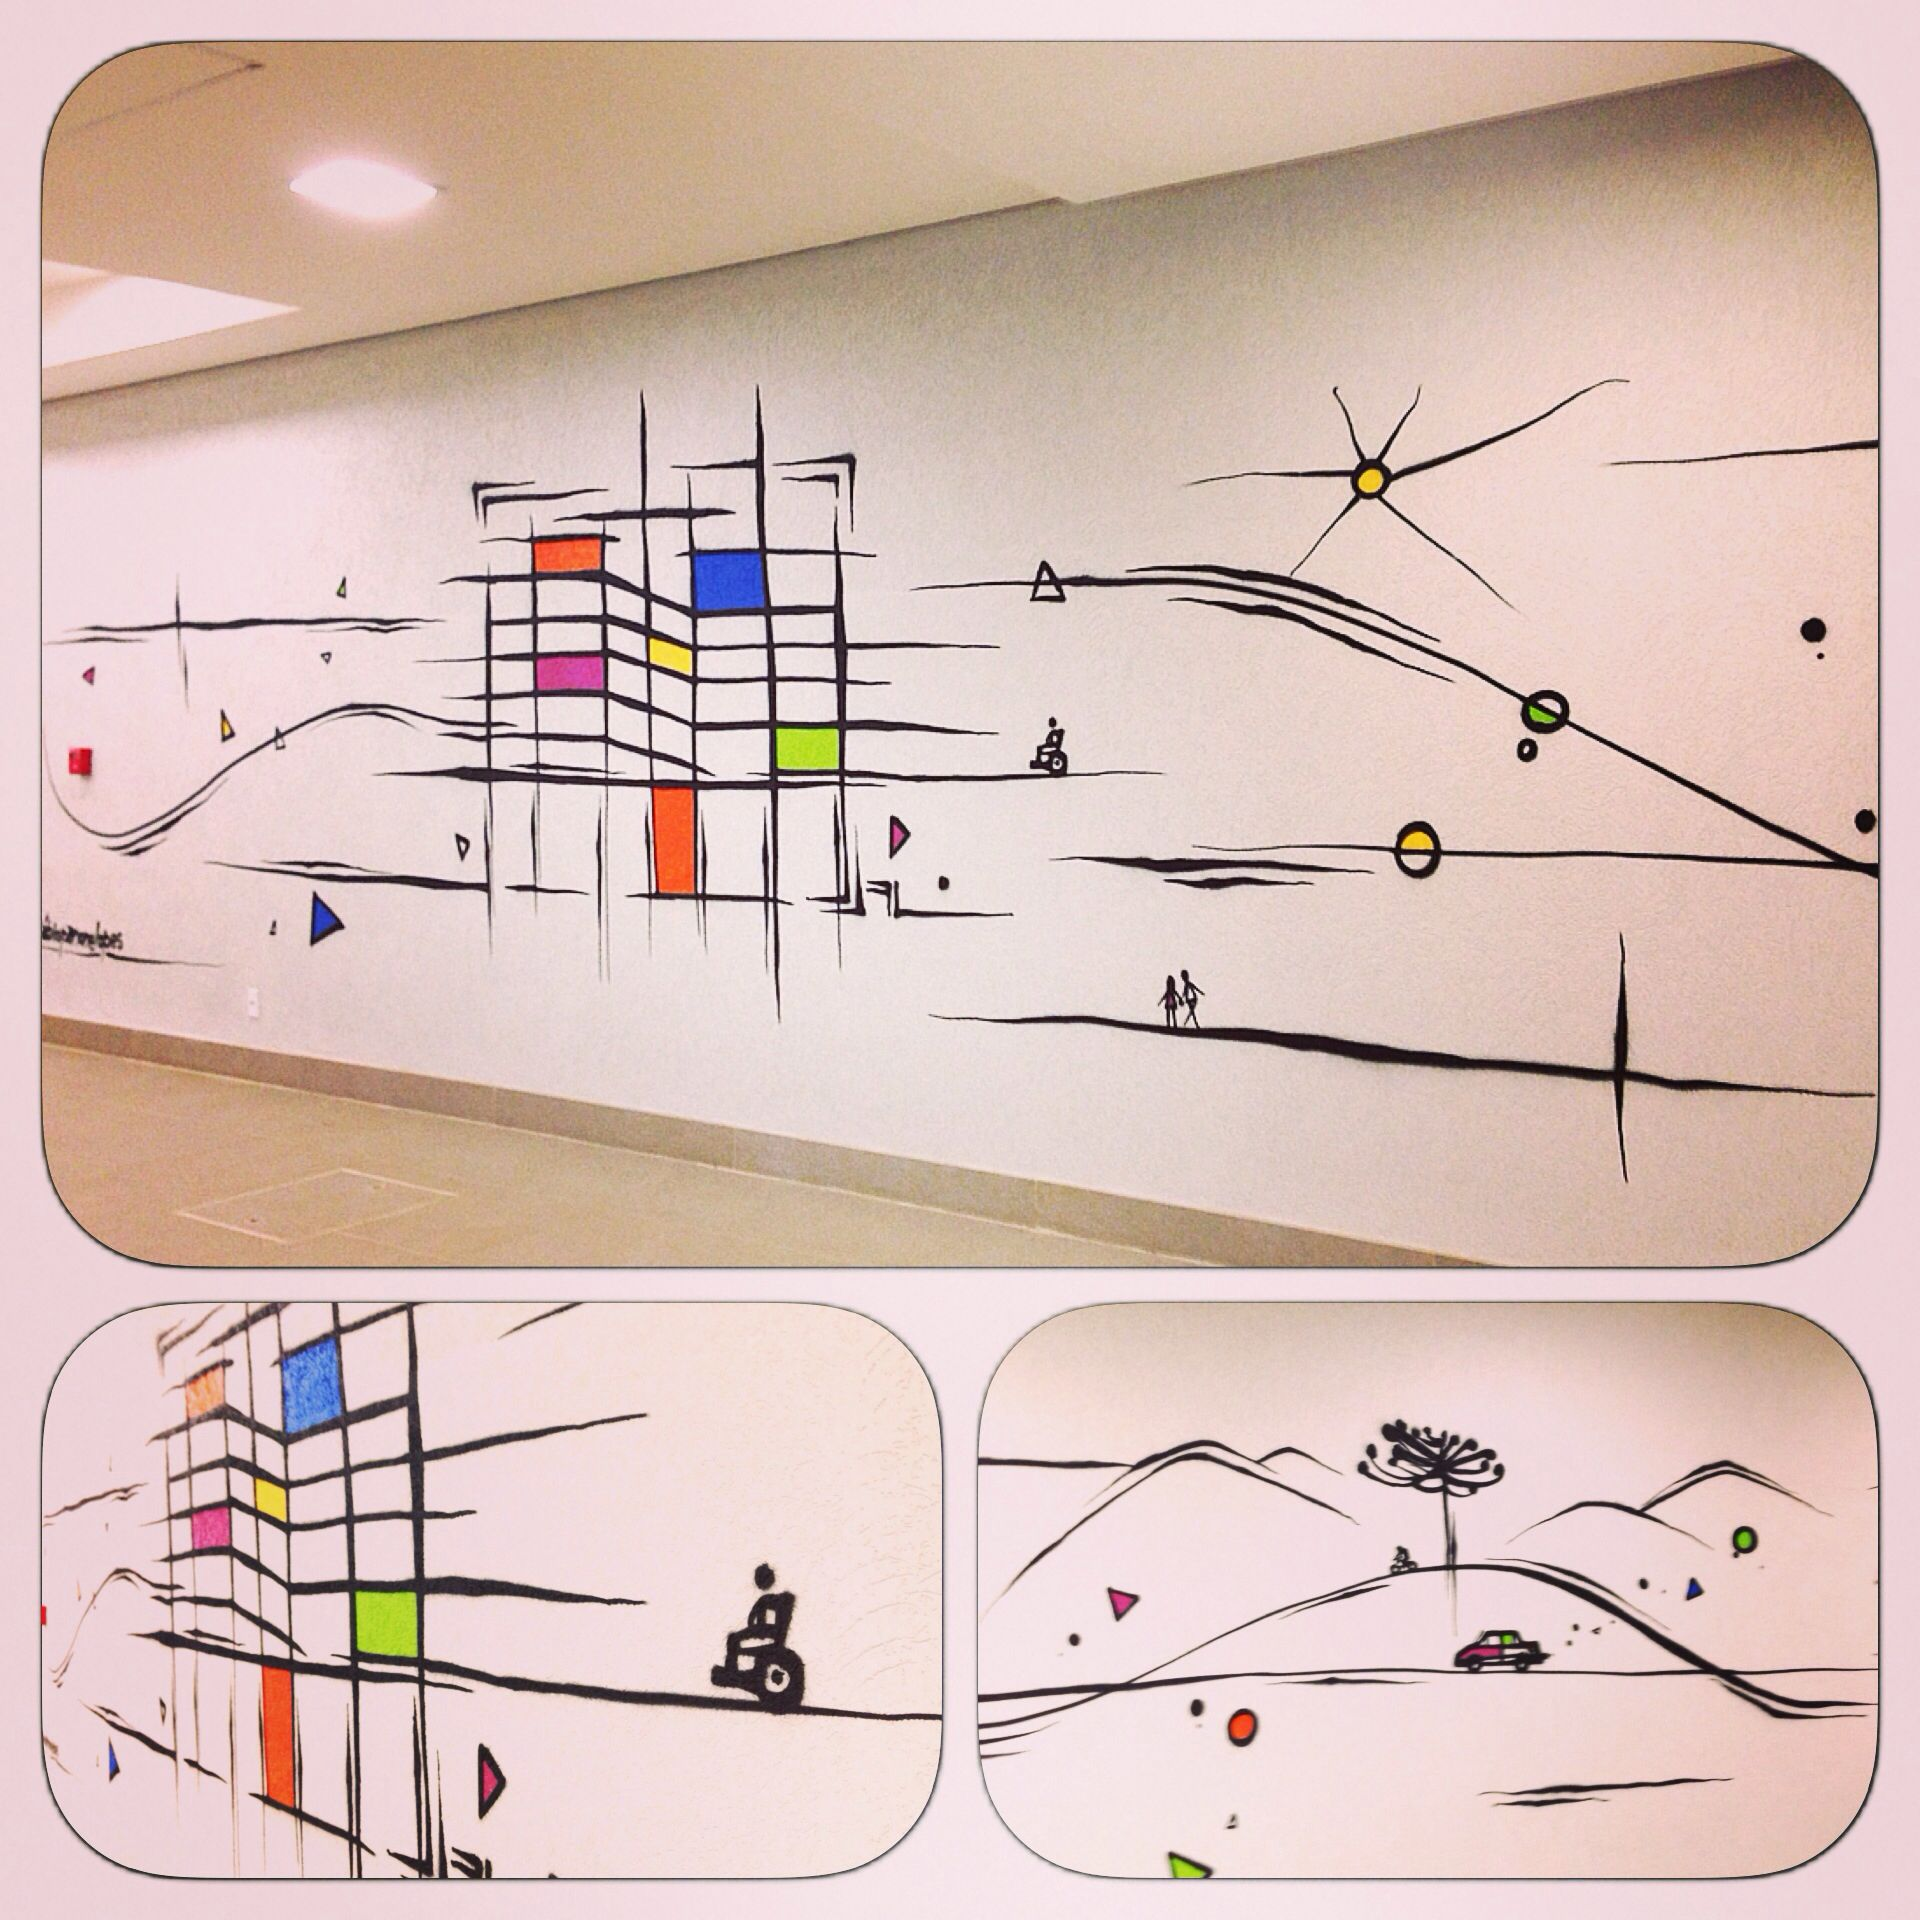 Painel interno - Galeria Comercial - Porto Alegre - Artista: Fábio Panone Lopes